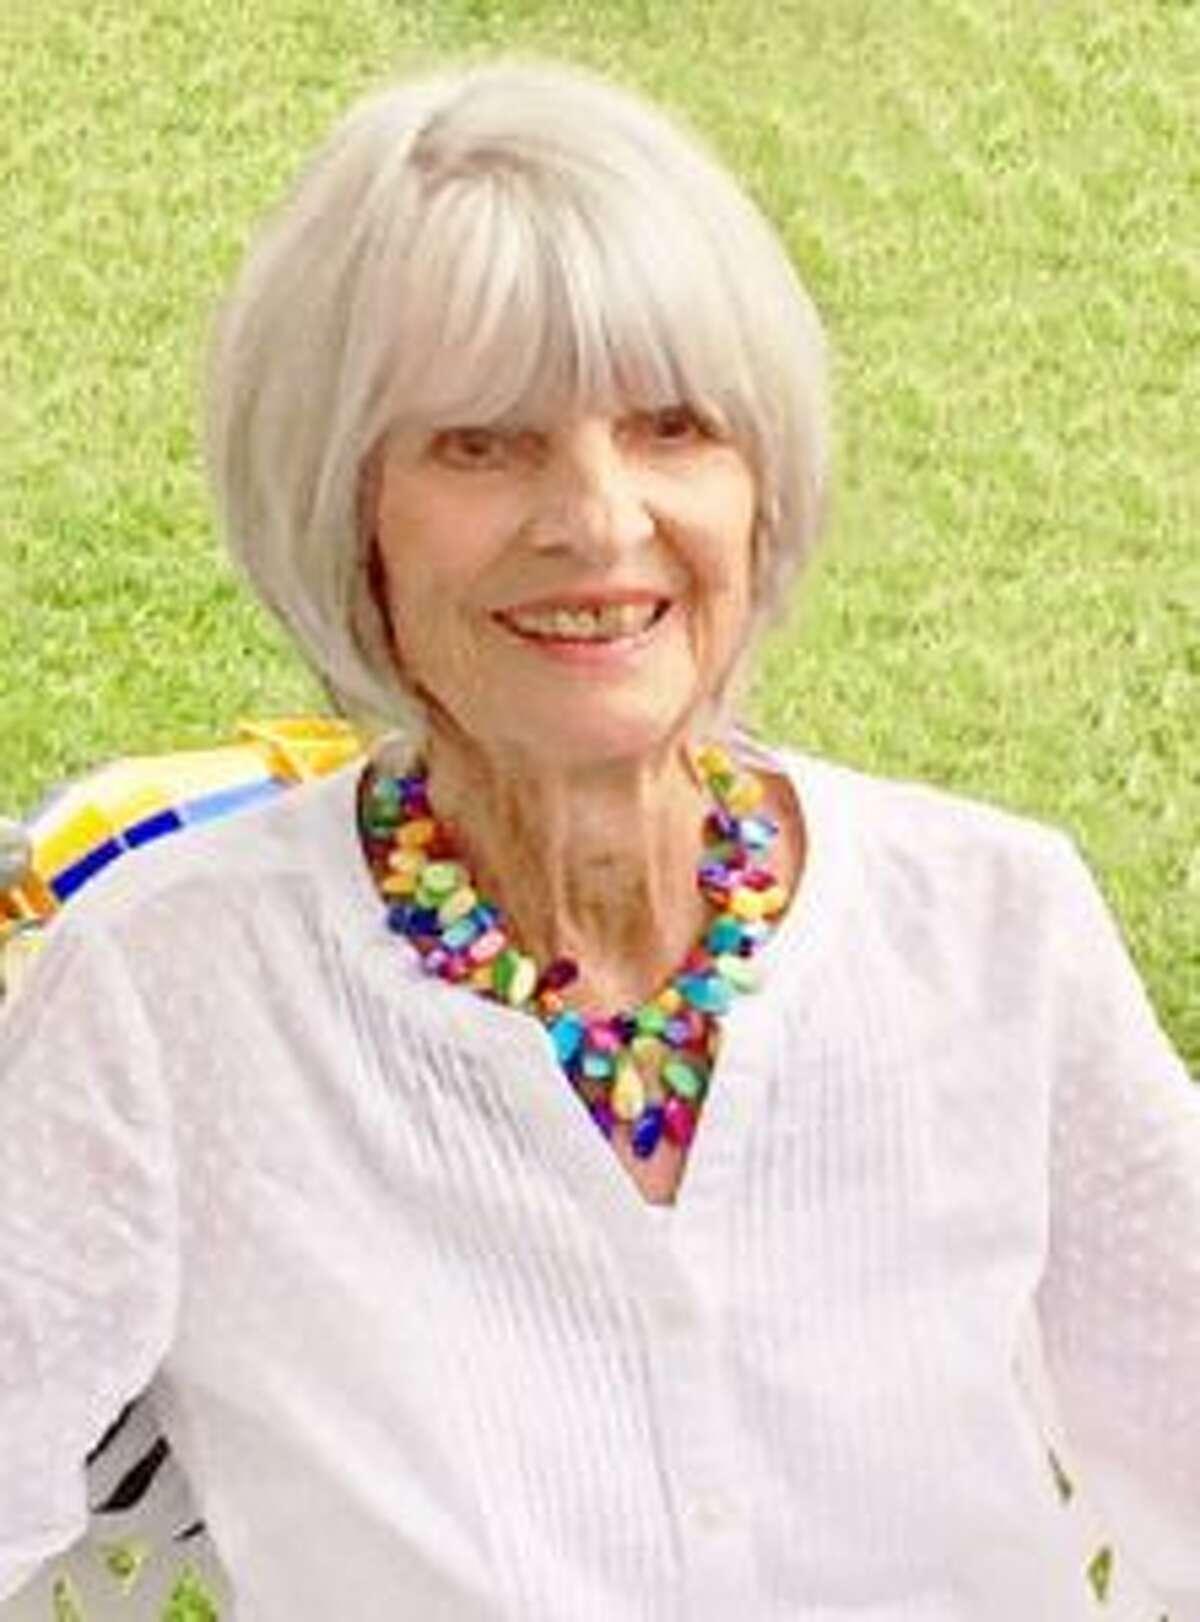 Gail Lutz Nill